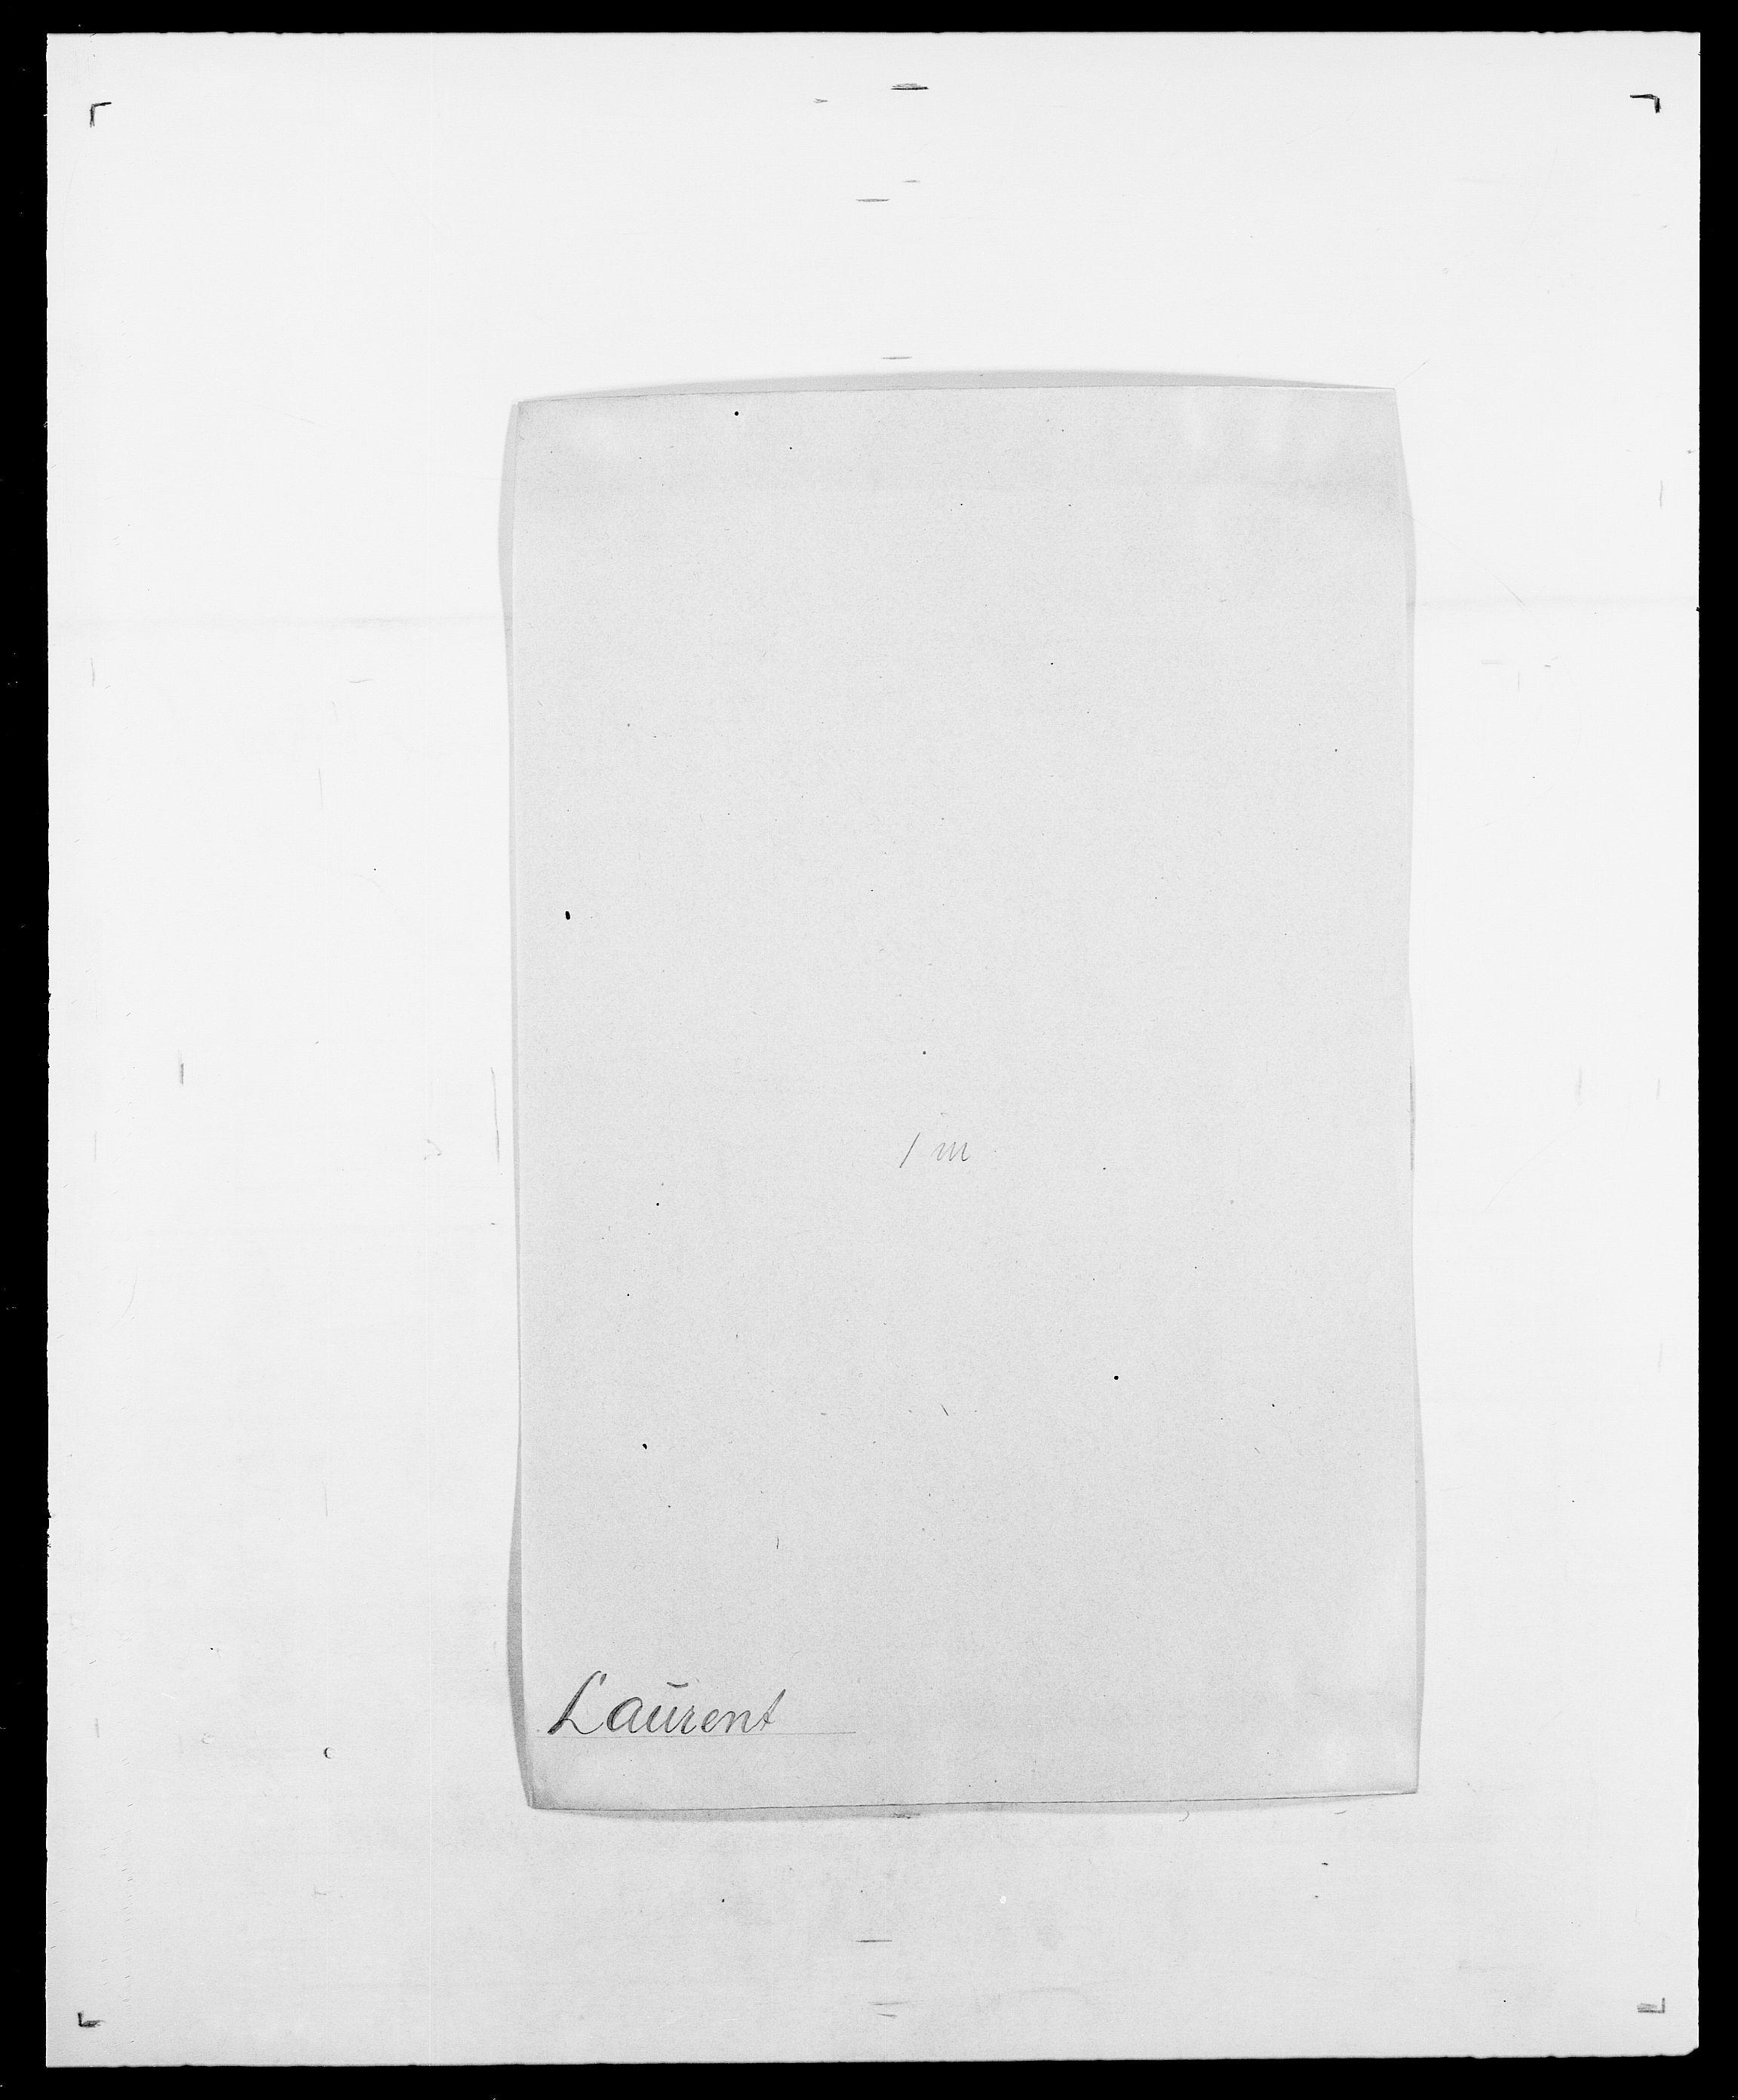 SAO, Delgobe, Charles Antoine - samling, D/Da/L0023: Lau - Lirvyn, s. 24